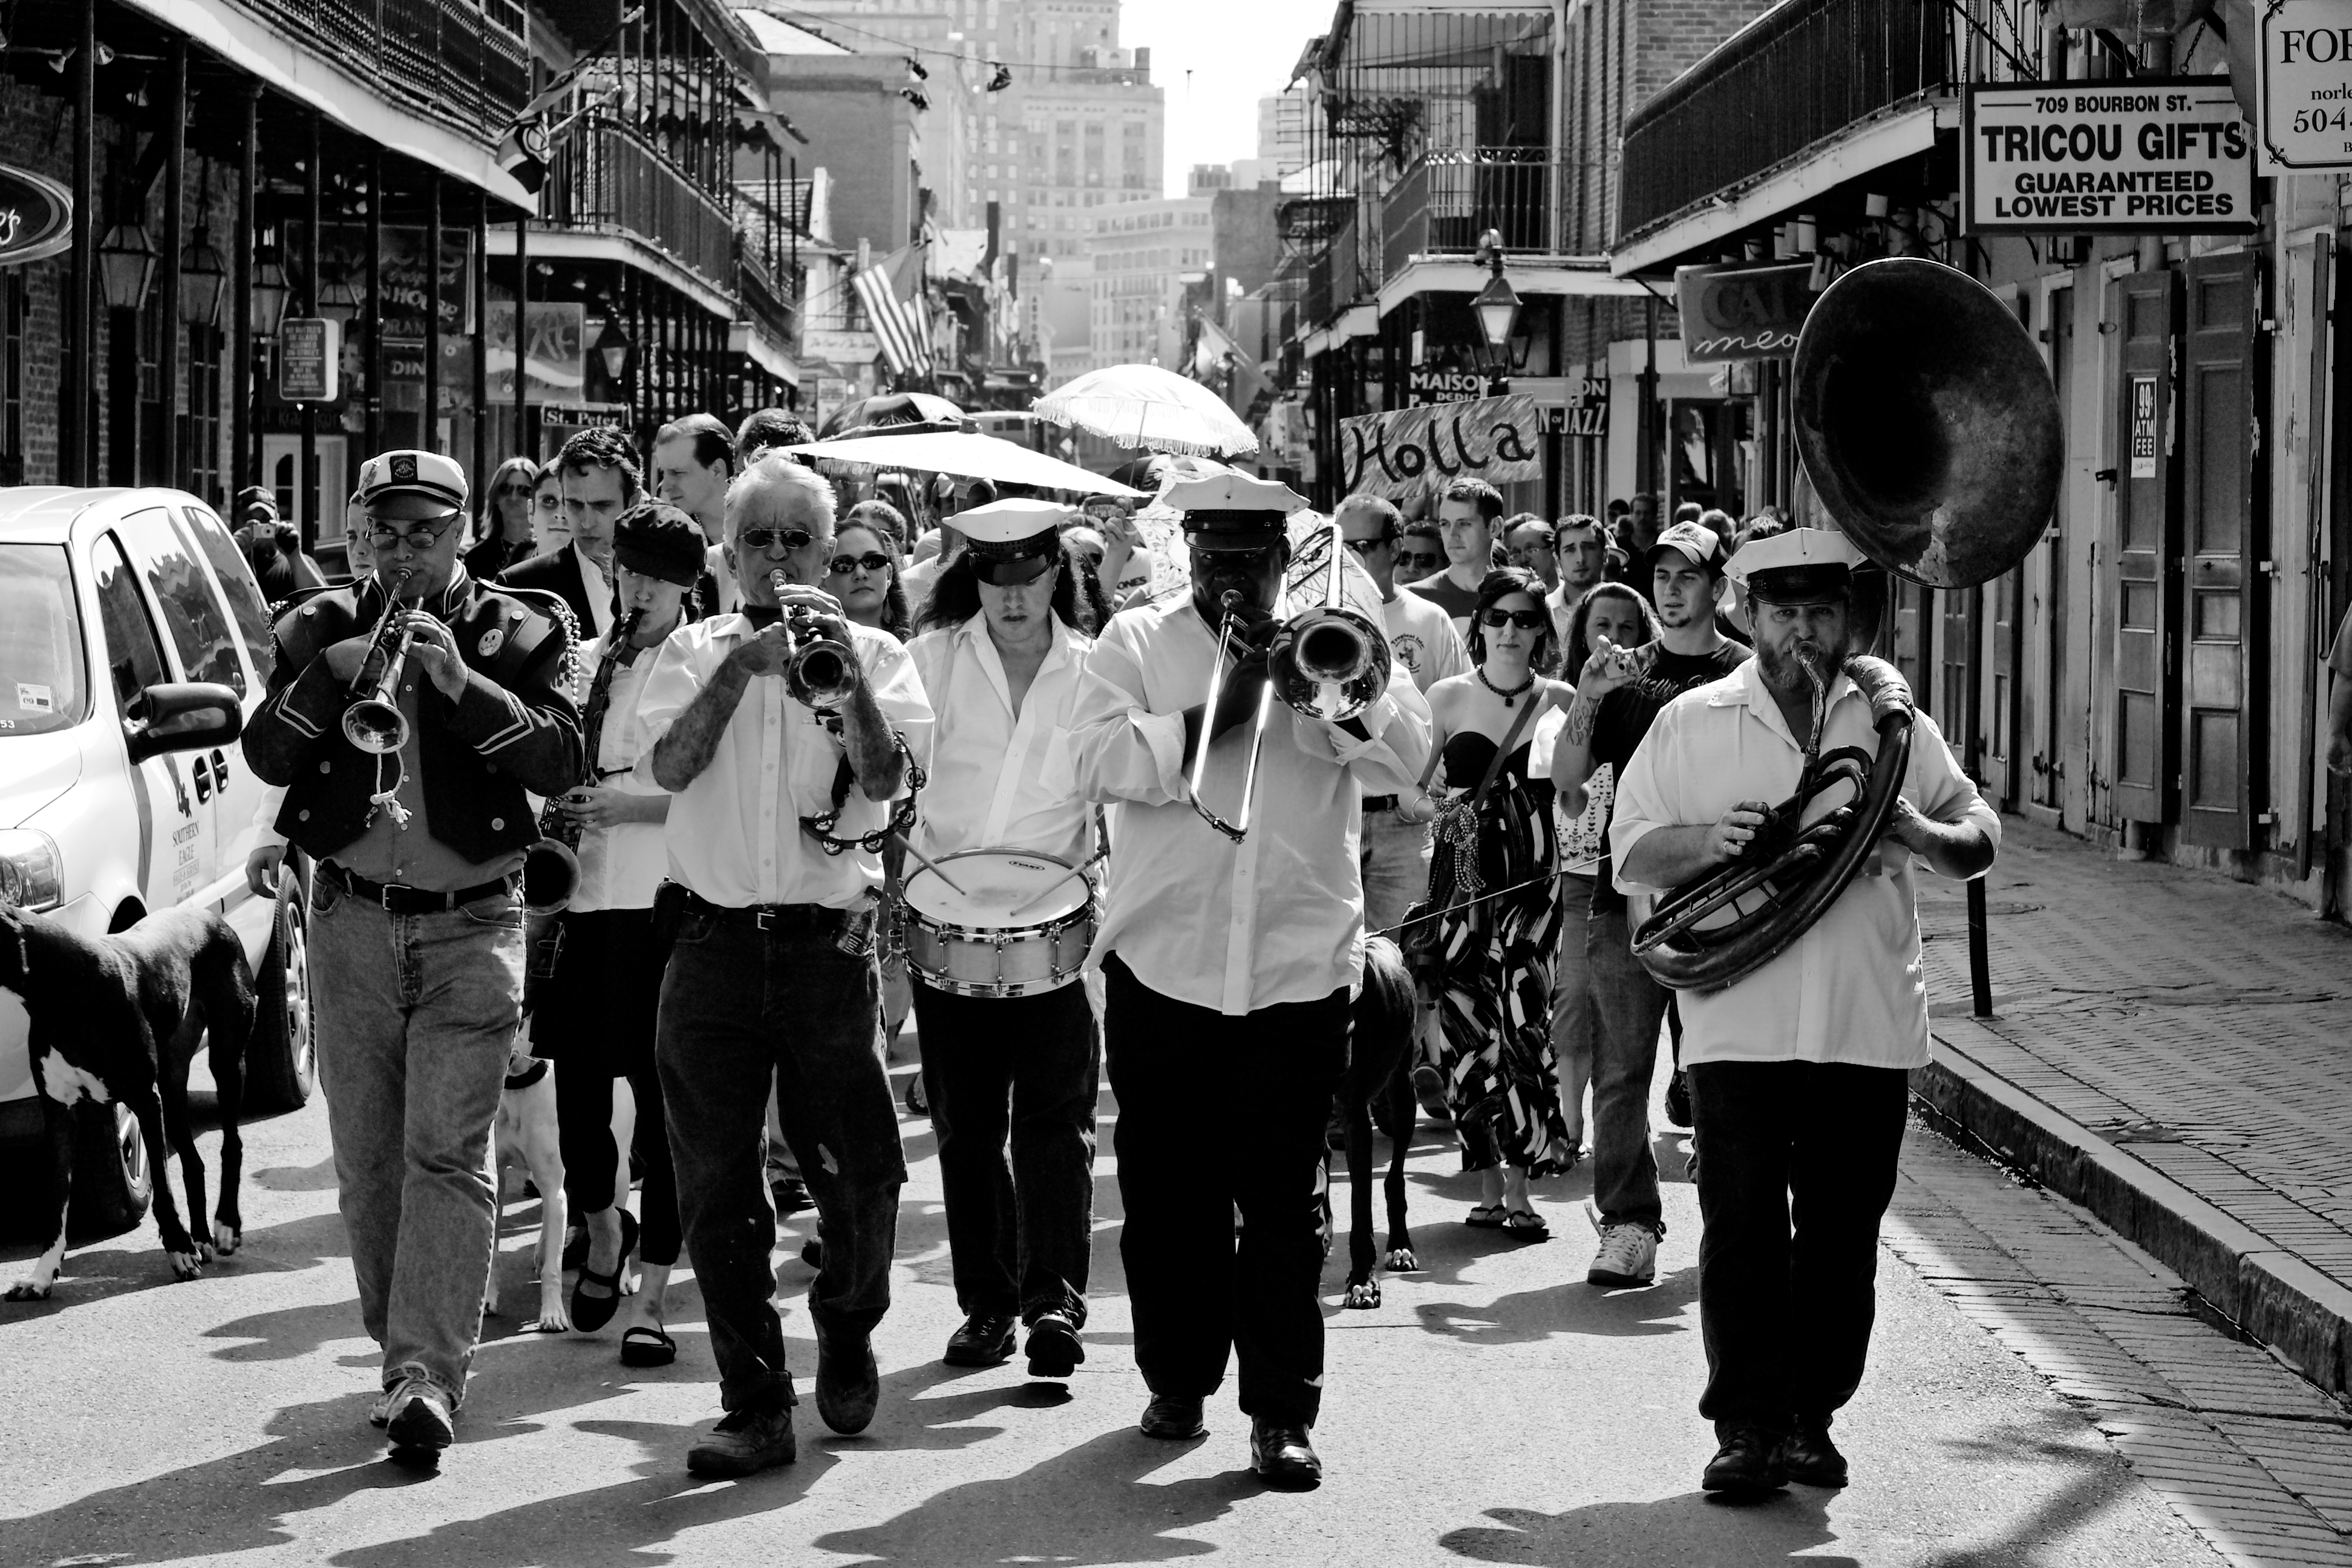 Jump Street Band - Jump Street Band